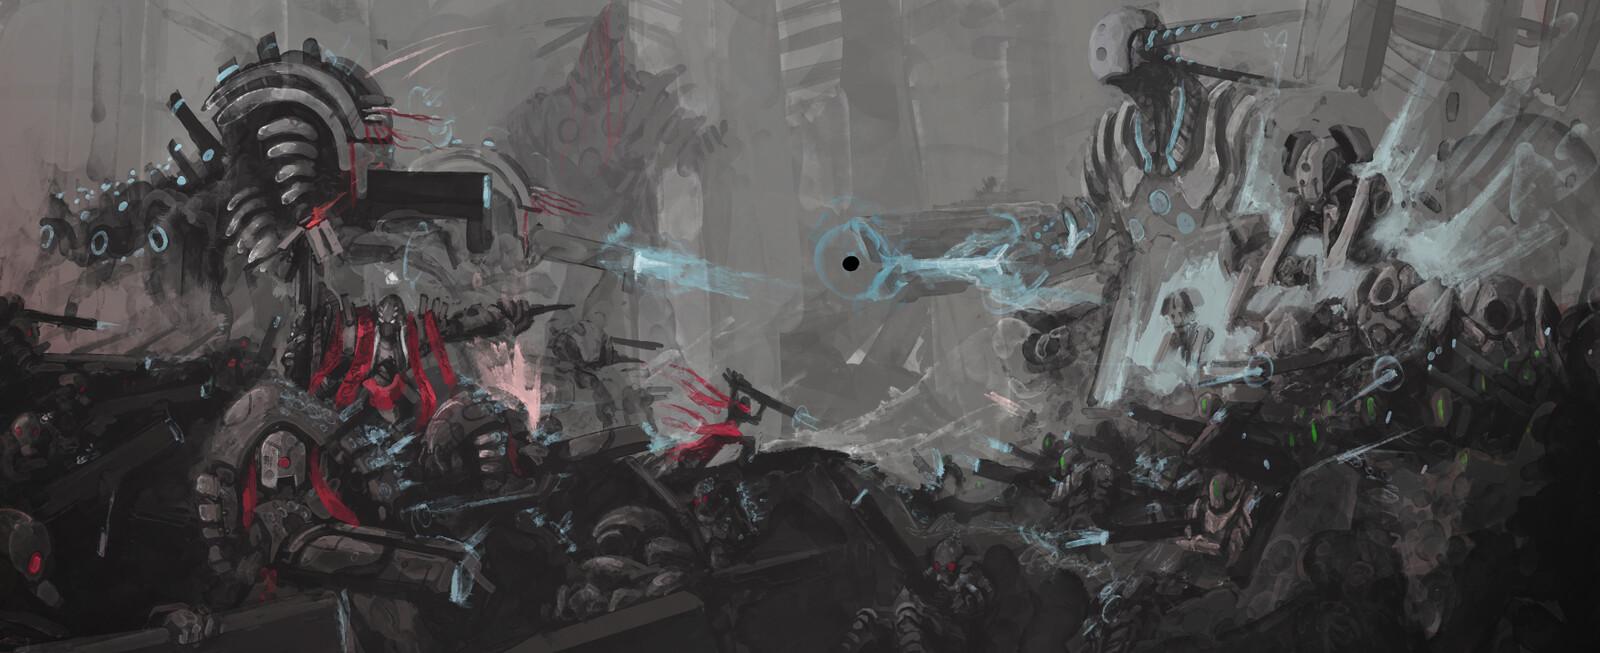 War of the destroyer